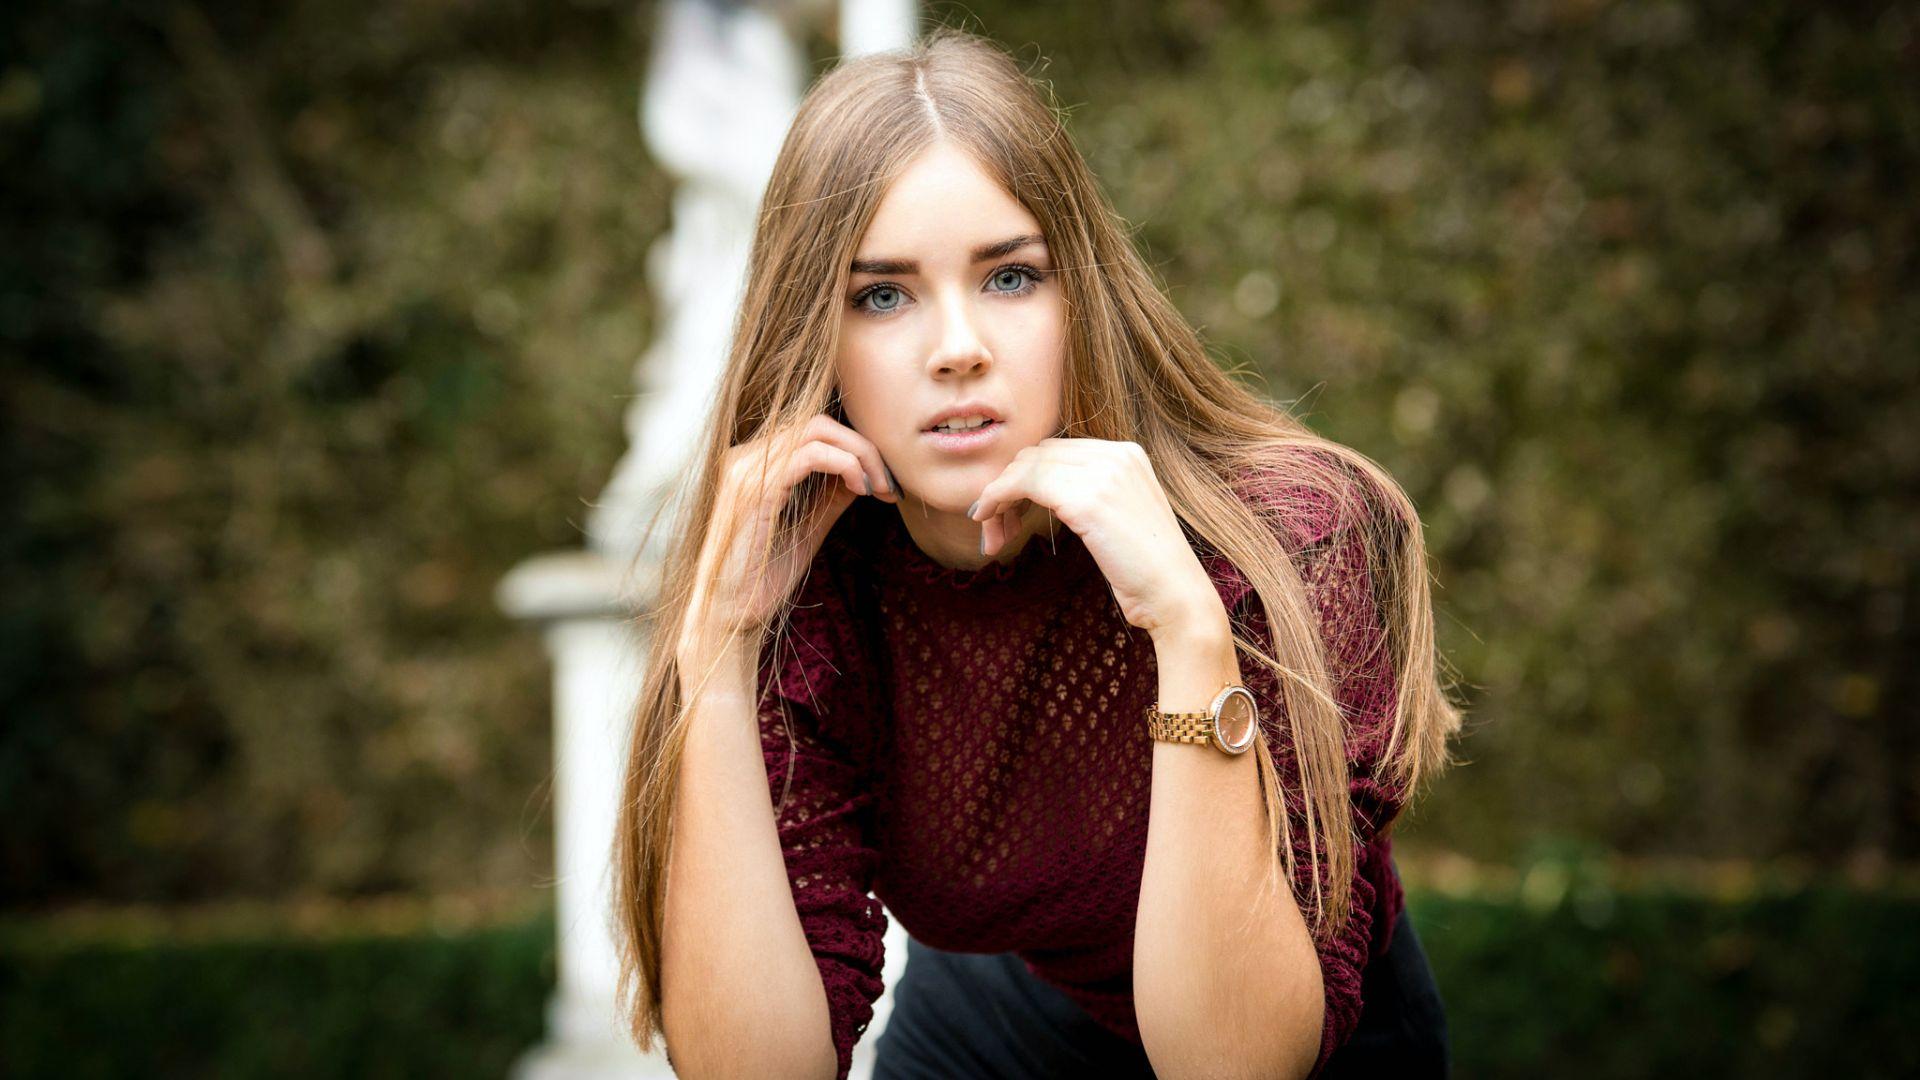 Wallpaper Blonde, girl model, long hair, beautiful